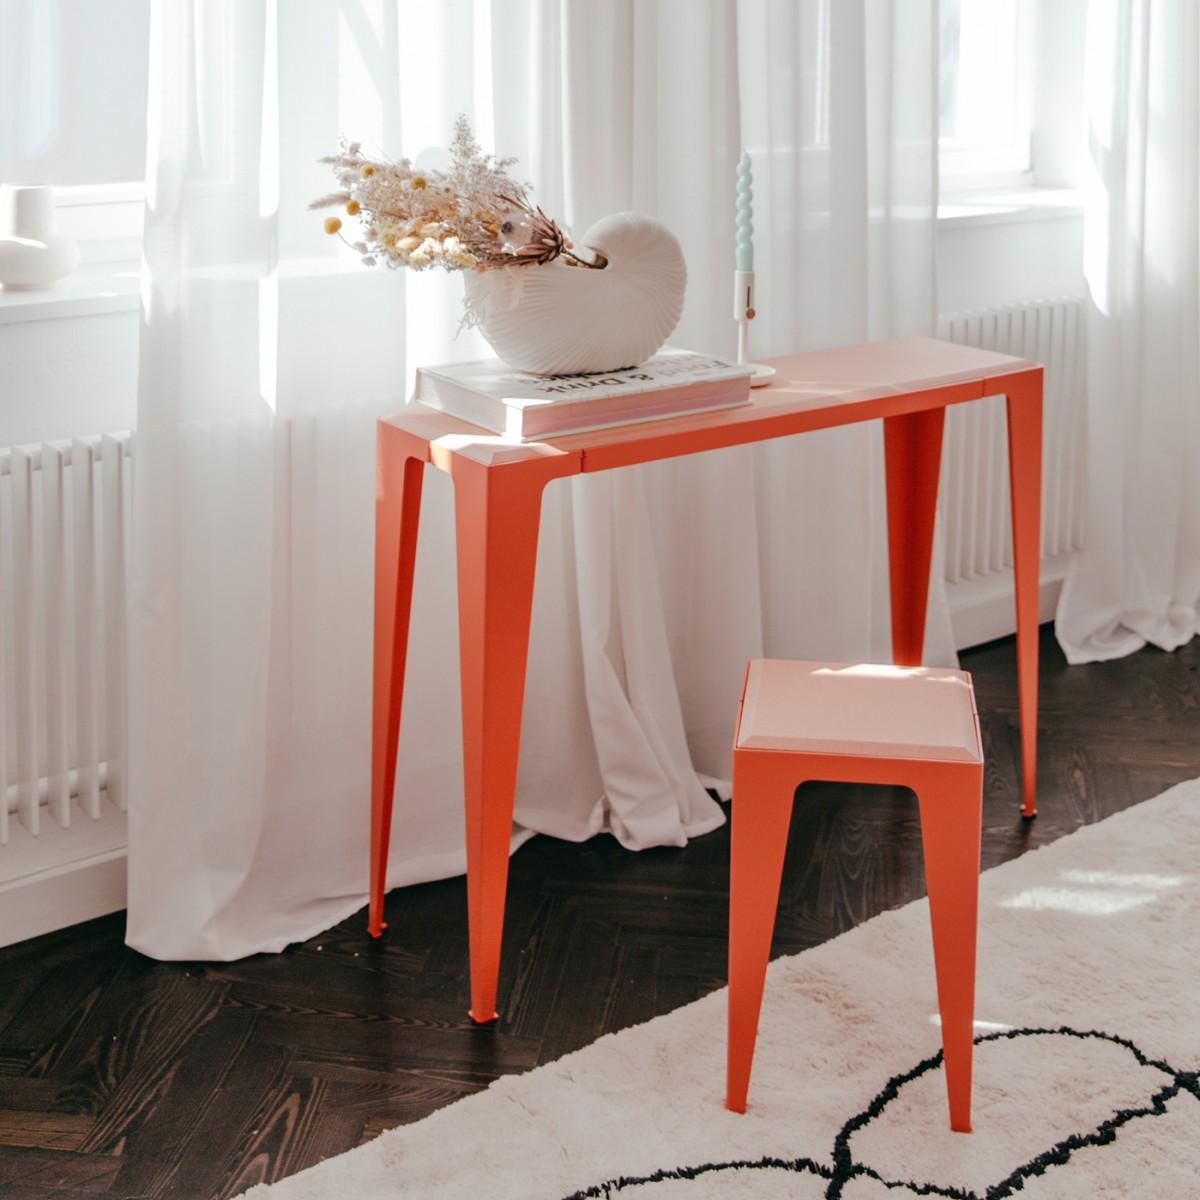 KONSOLE |CHAMFER| nachhaltiges Möbeldesign | WYE